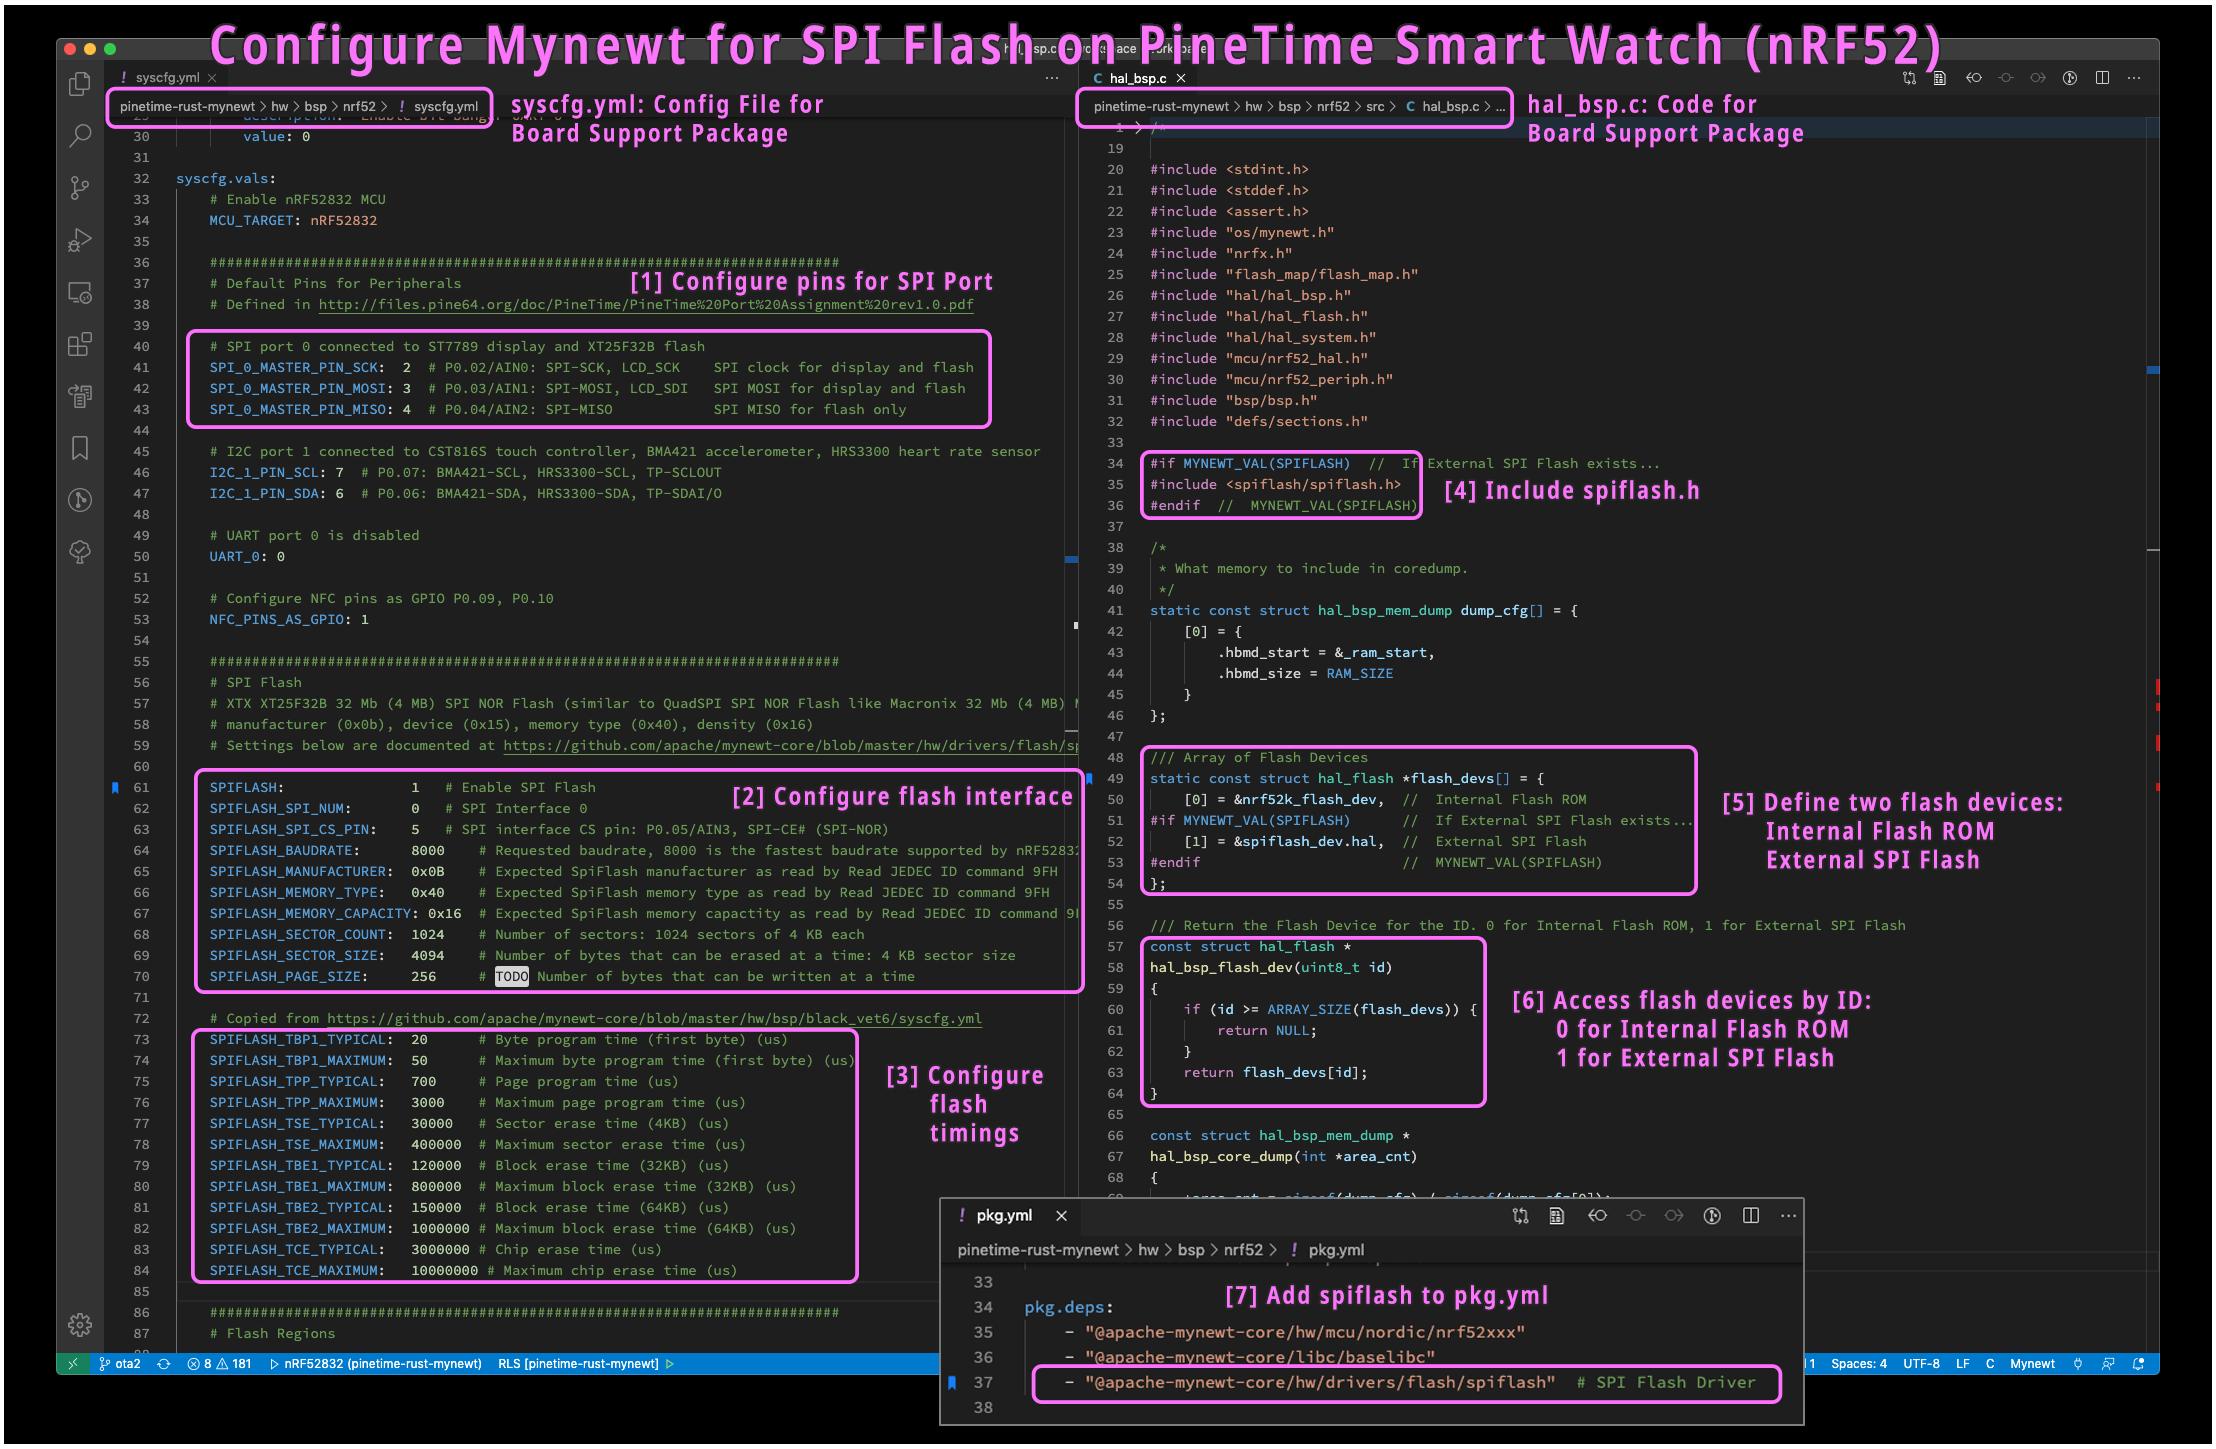 Configure Mynewt for SPI Flash on PineTime Smart Watch (nRF52)